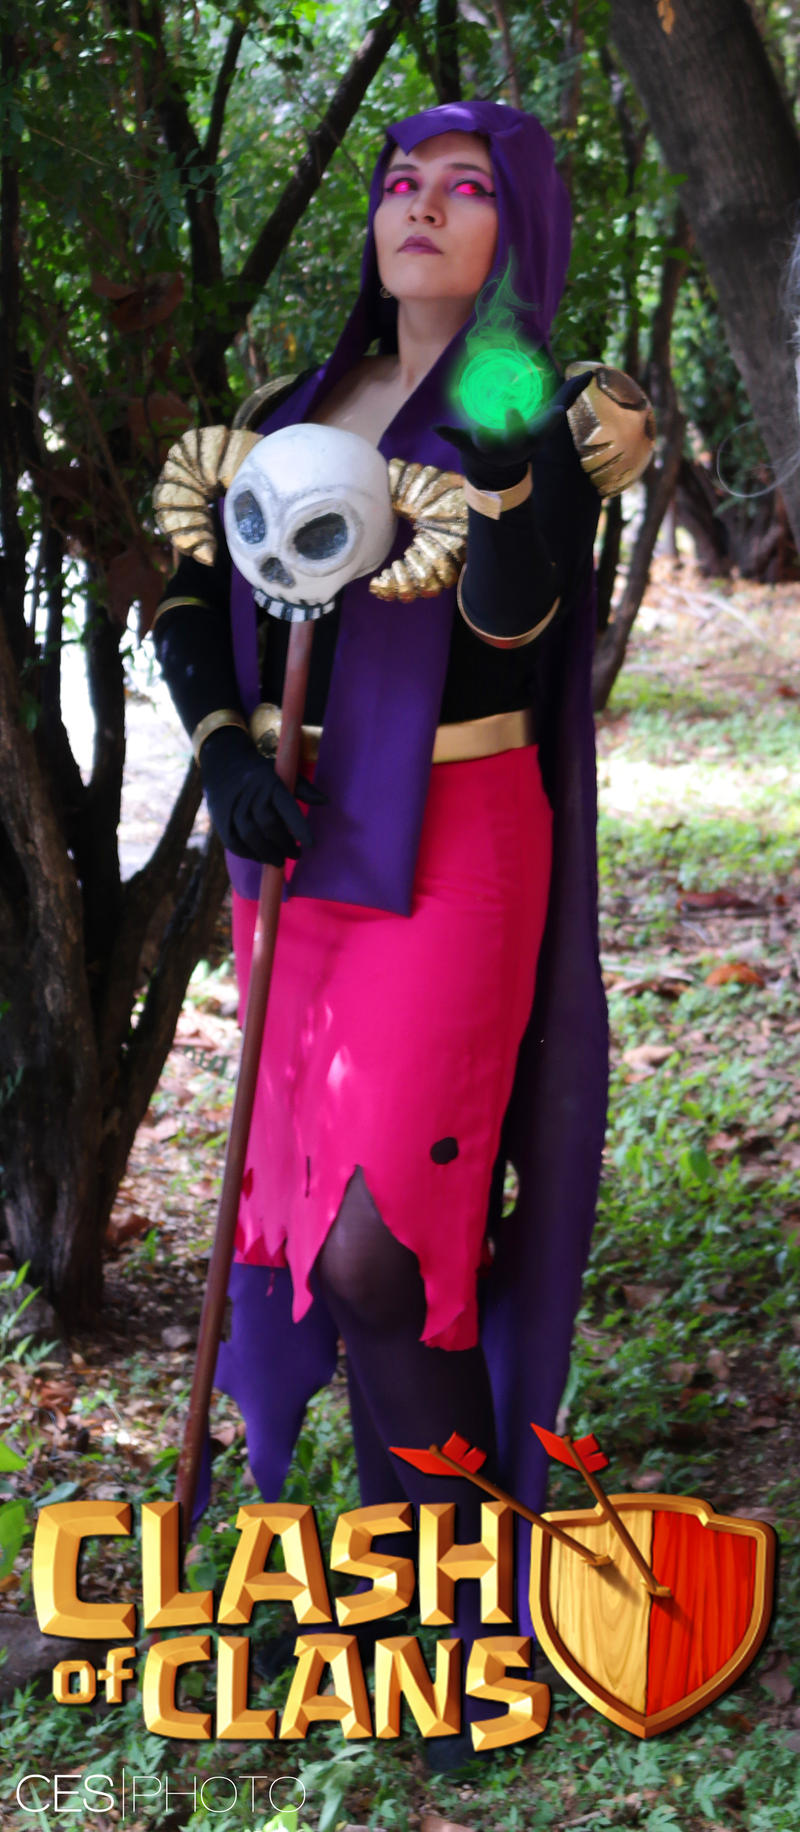 clash of clans bruja 2 by Blancaliliam on DeviantArt